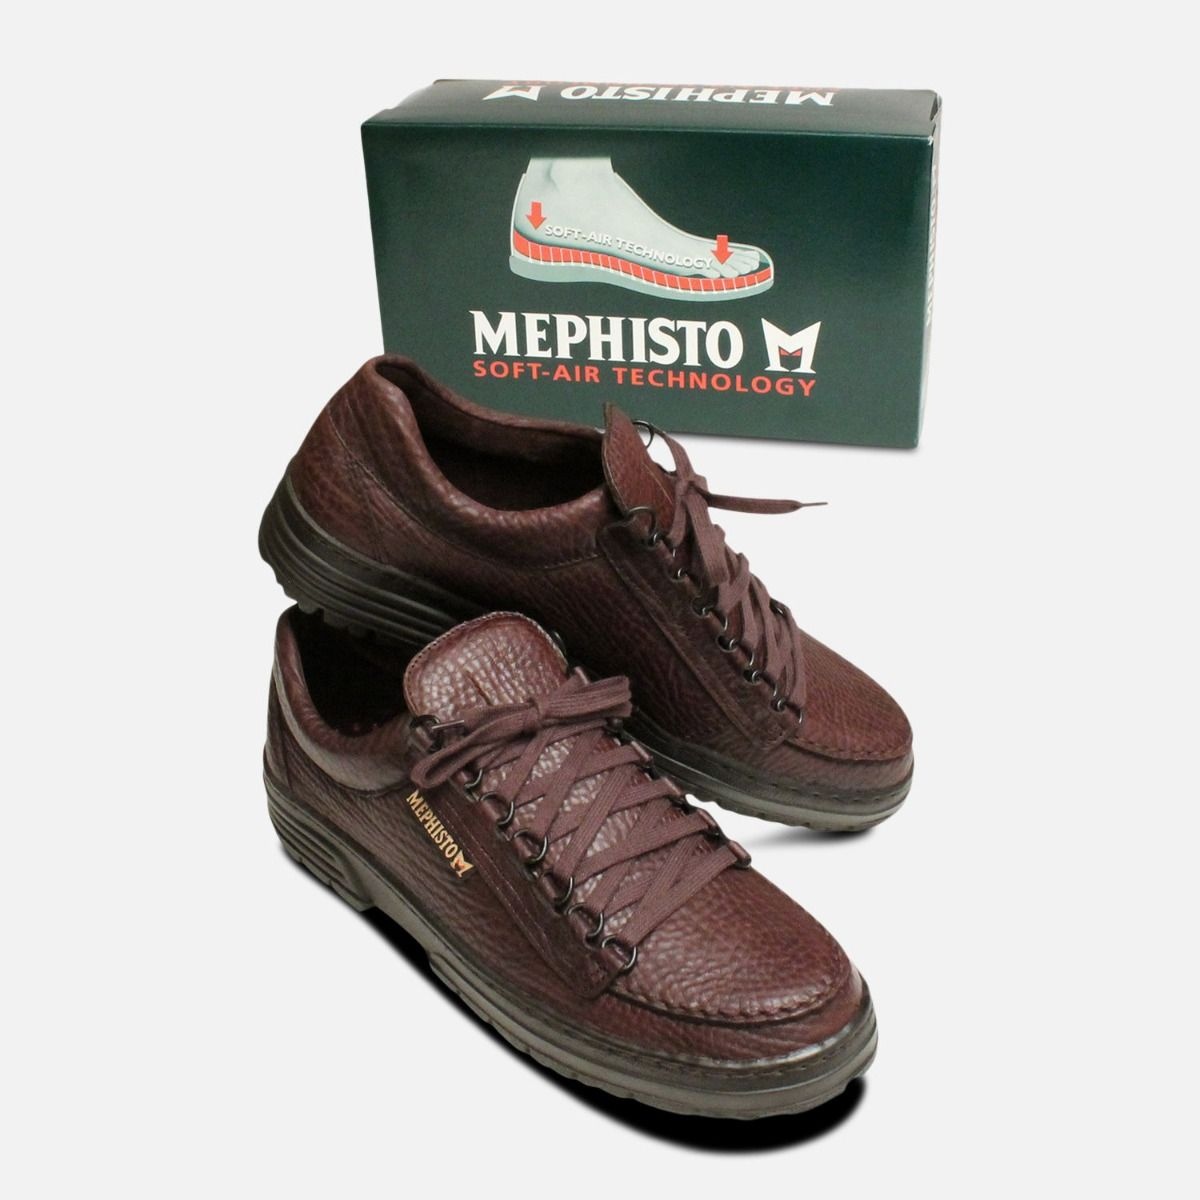 396fdaed49 Mephisto Shoes Cruiser 2 Dark Brown Mamouth